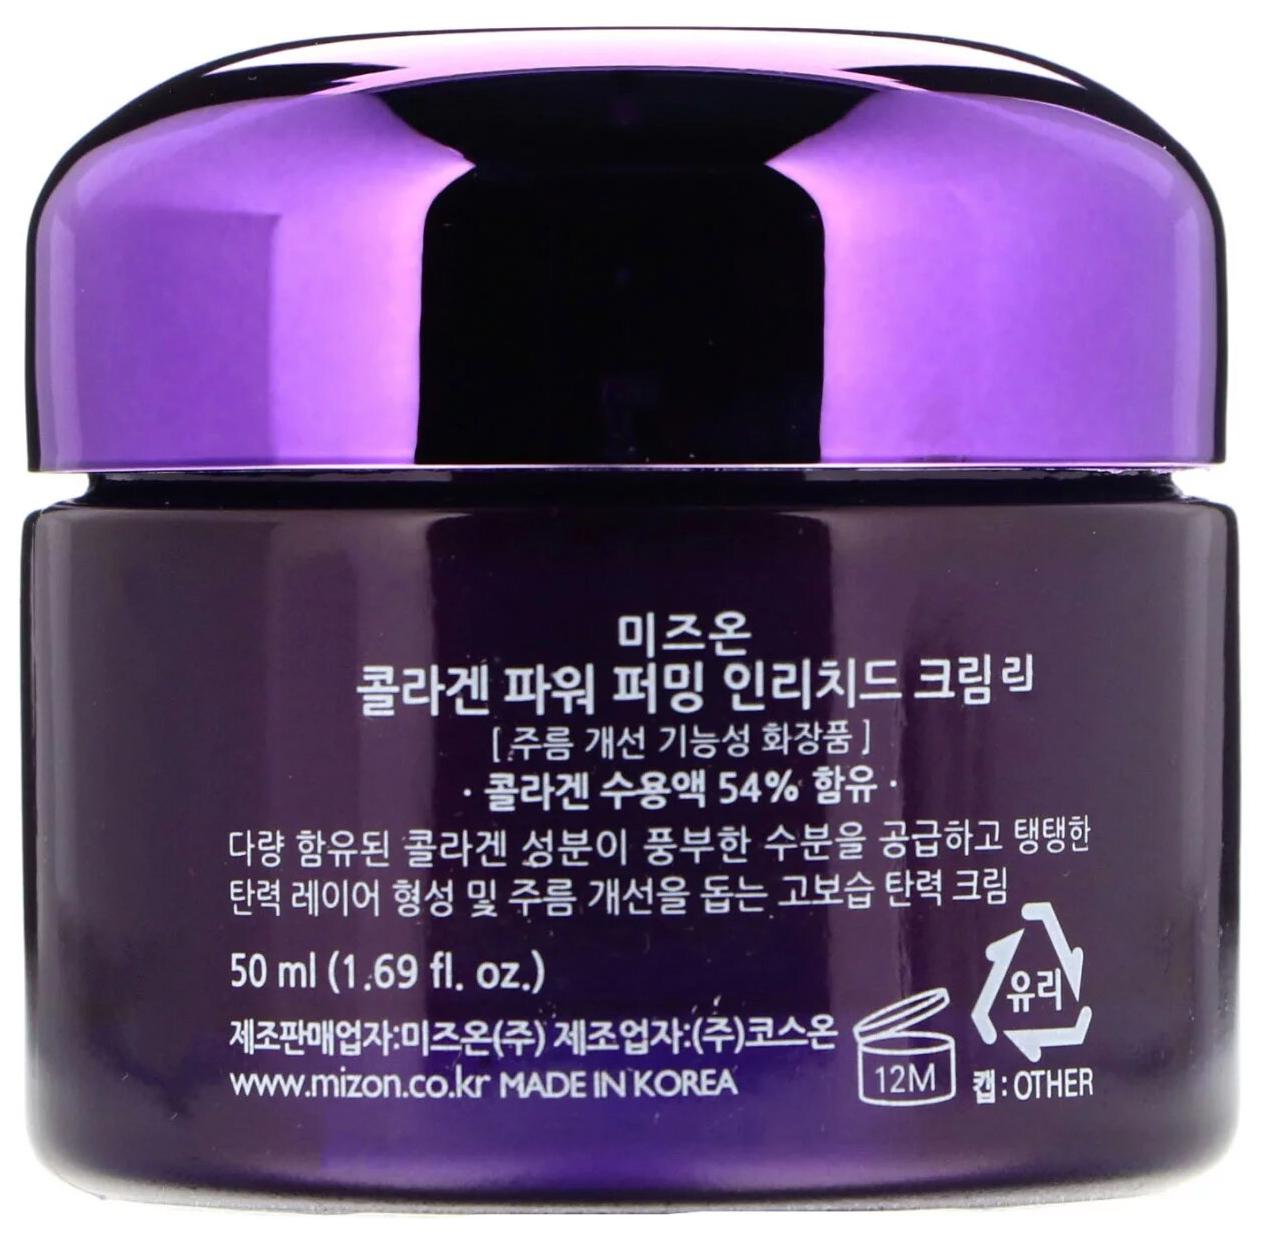 купить корейскую косметику мизон